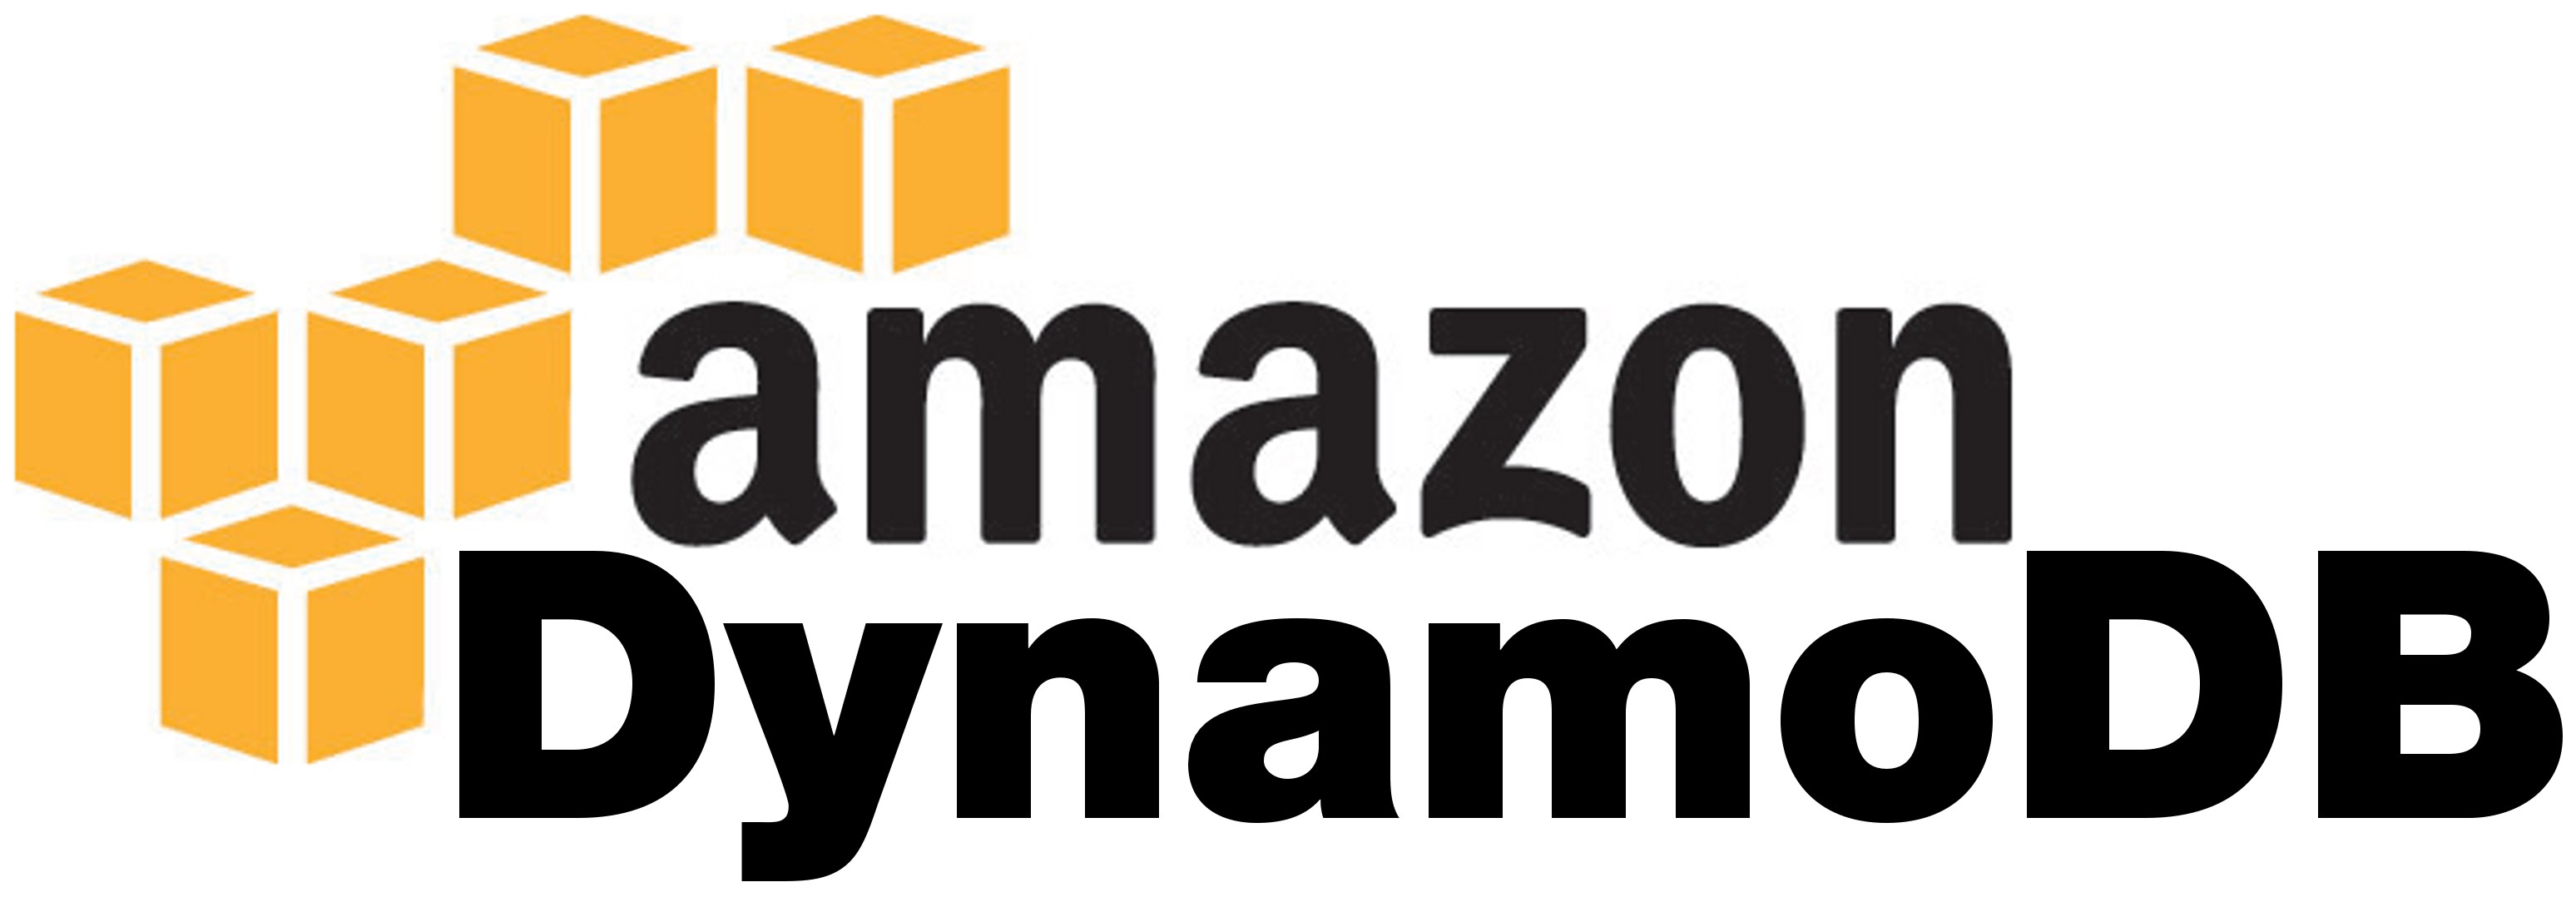 Amazon DynamoDB.